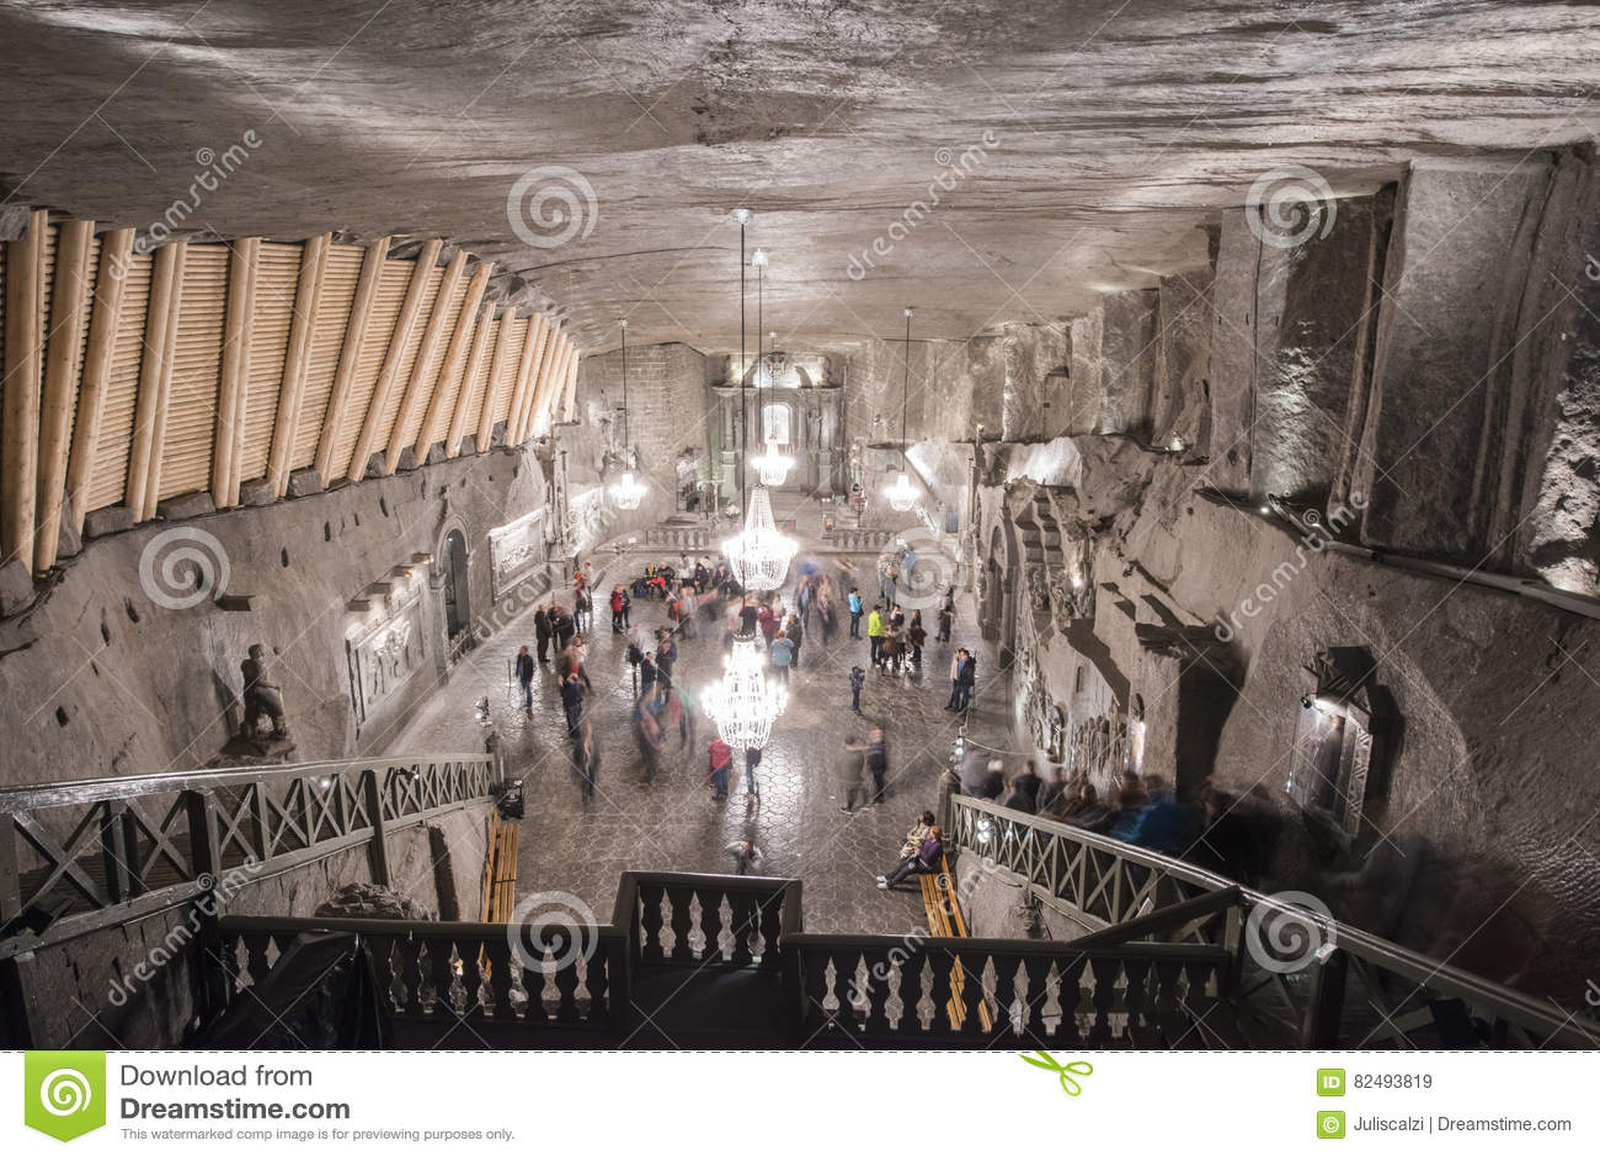 Poland's Ondergrondse Zoute Kathedraal